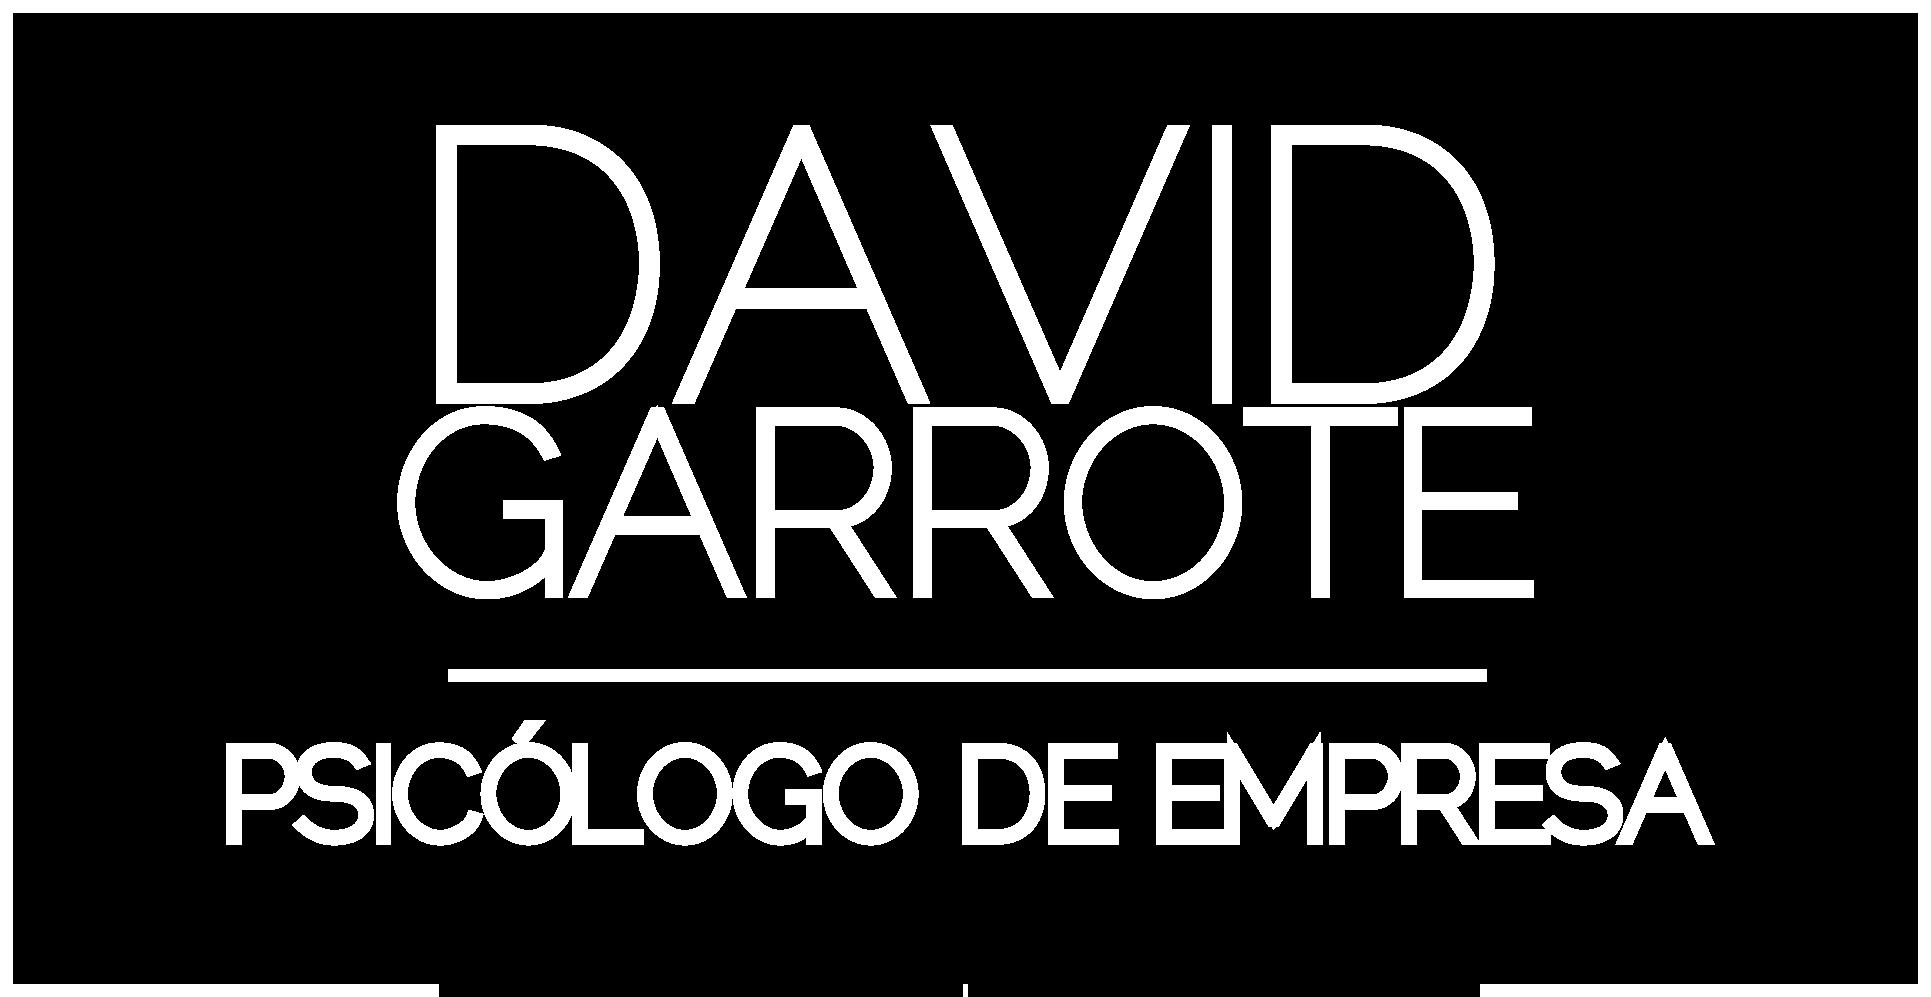 DAVIDGARROTE.COM